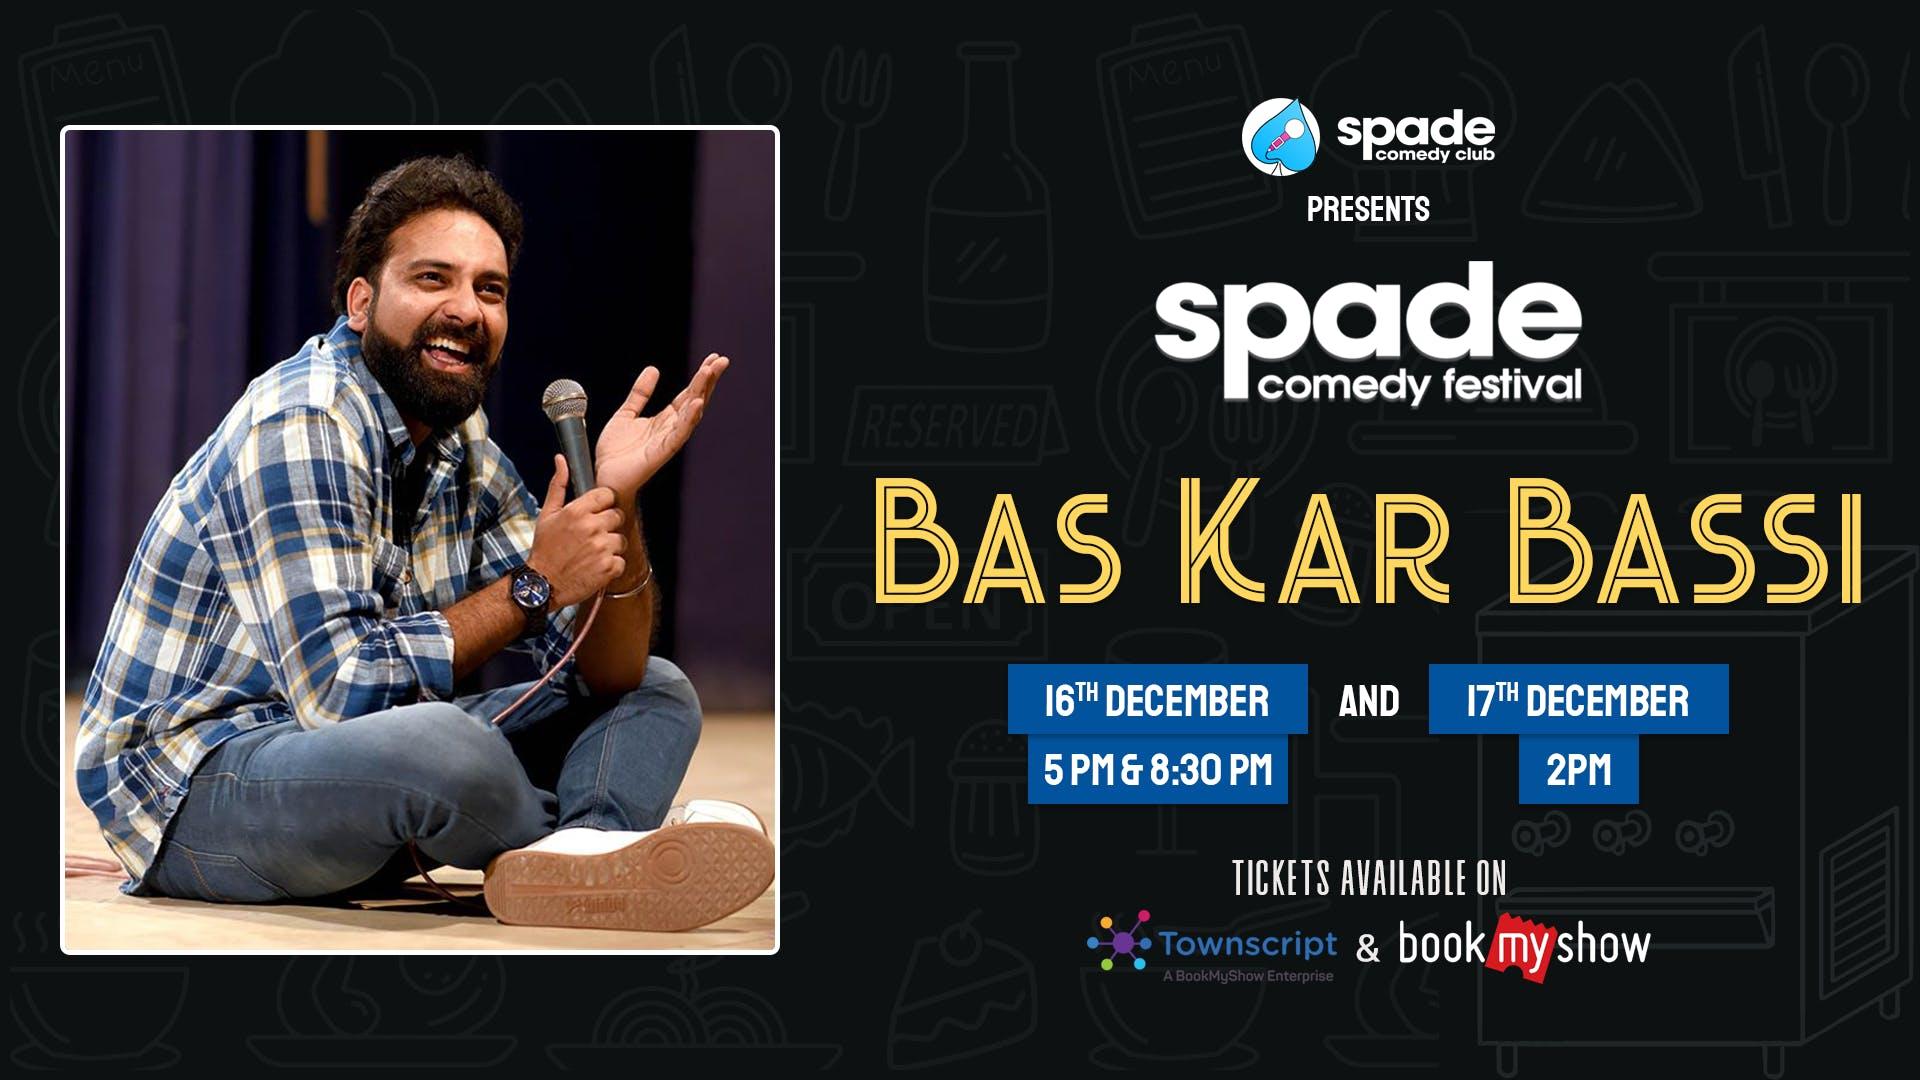 Bas Kar Bassi At Spade Comedy Festival